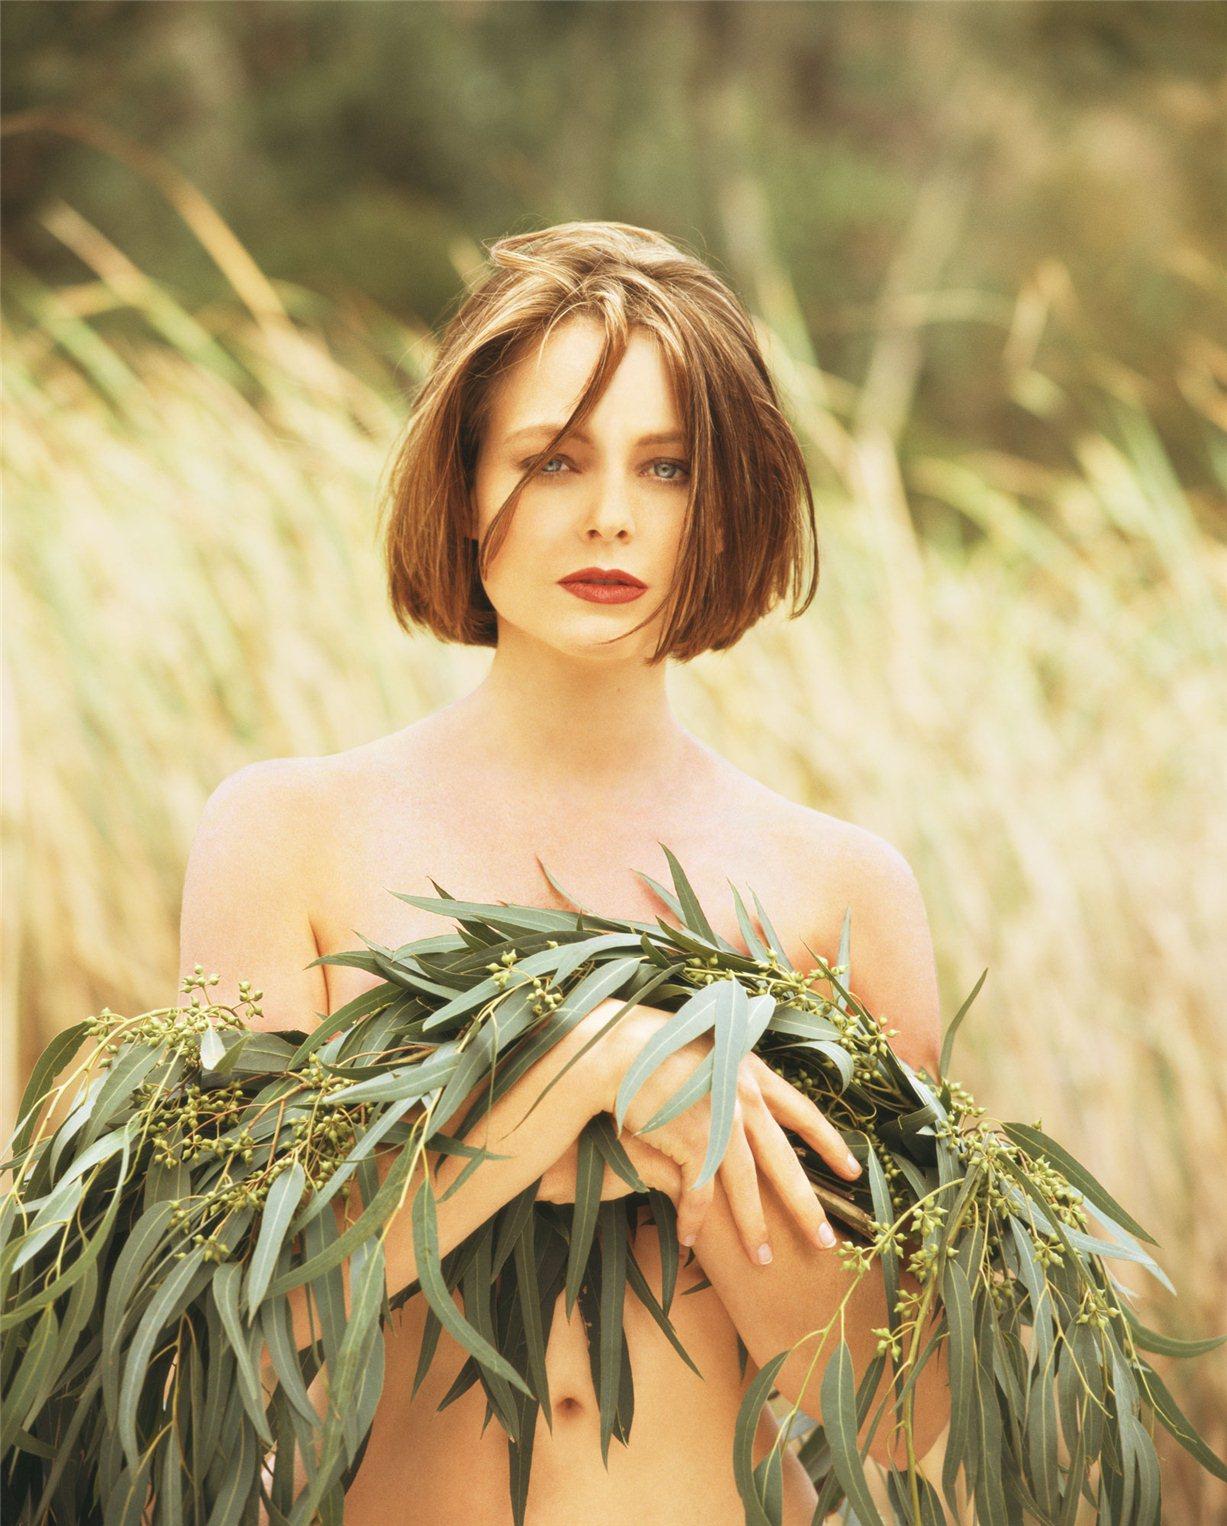 Jodie Foster / Джоди Фостер - звезды Голливуда, фотограф Firooz Zahedi